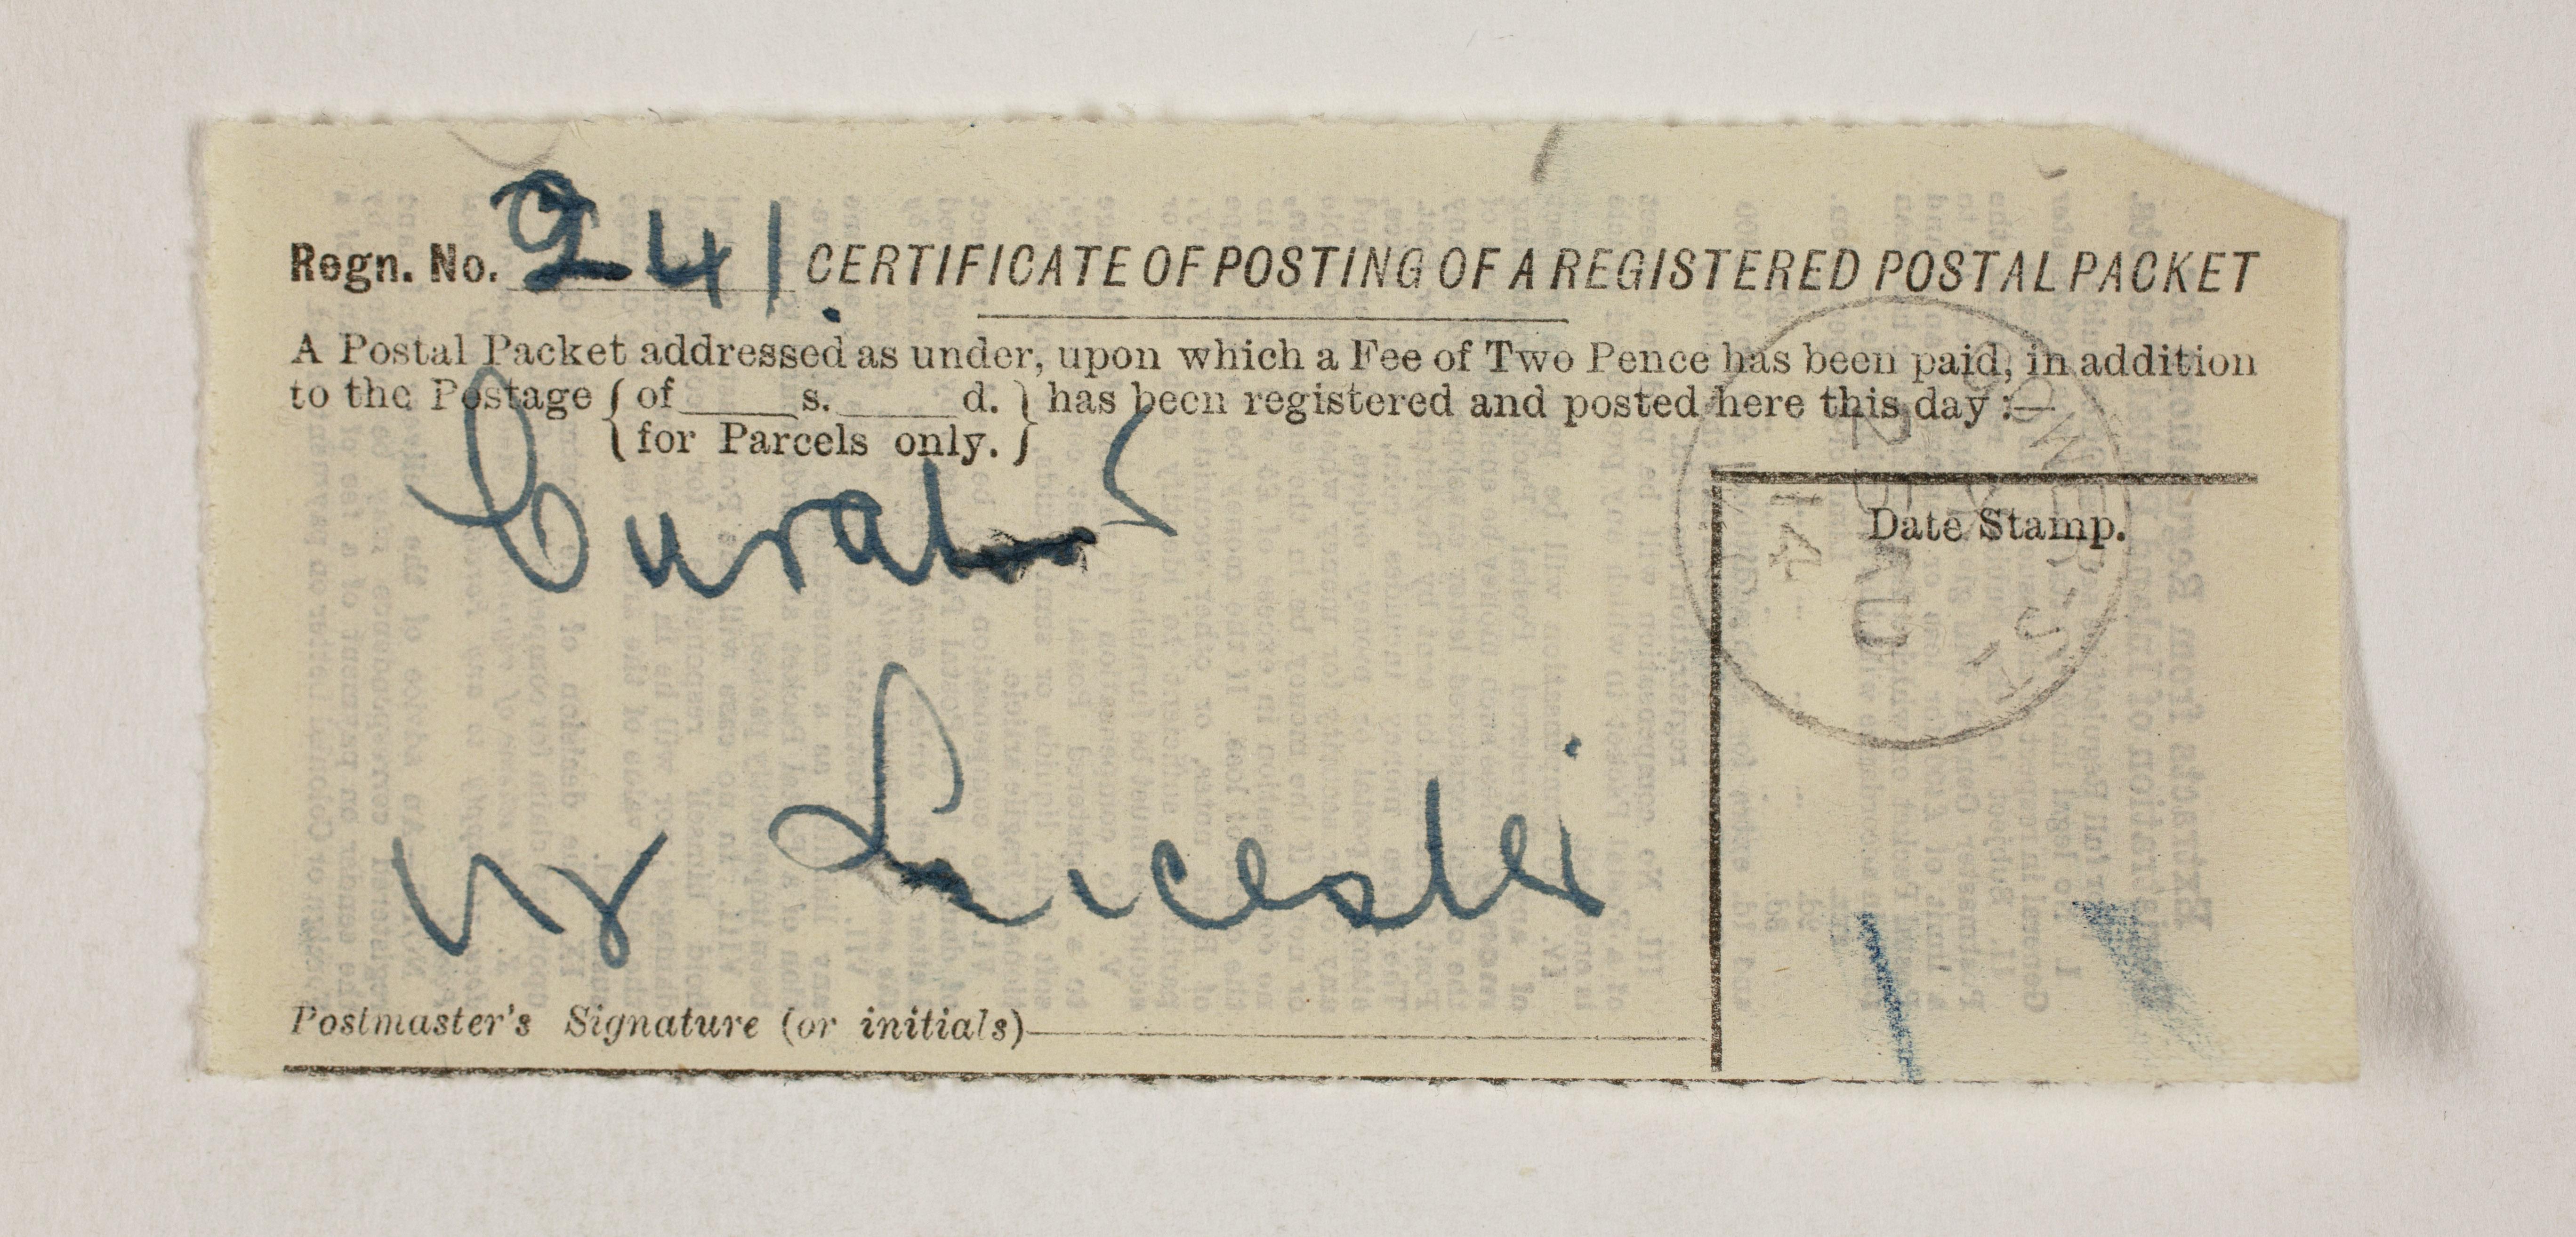 1913-14 Lahun, Haraga Mailing label PMA/WFP1/D/22/50.38